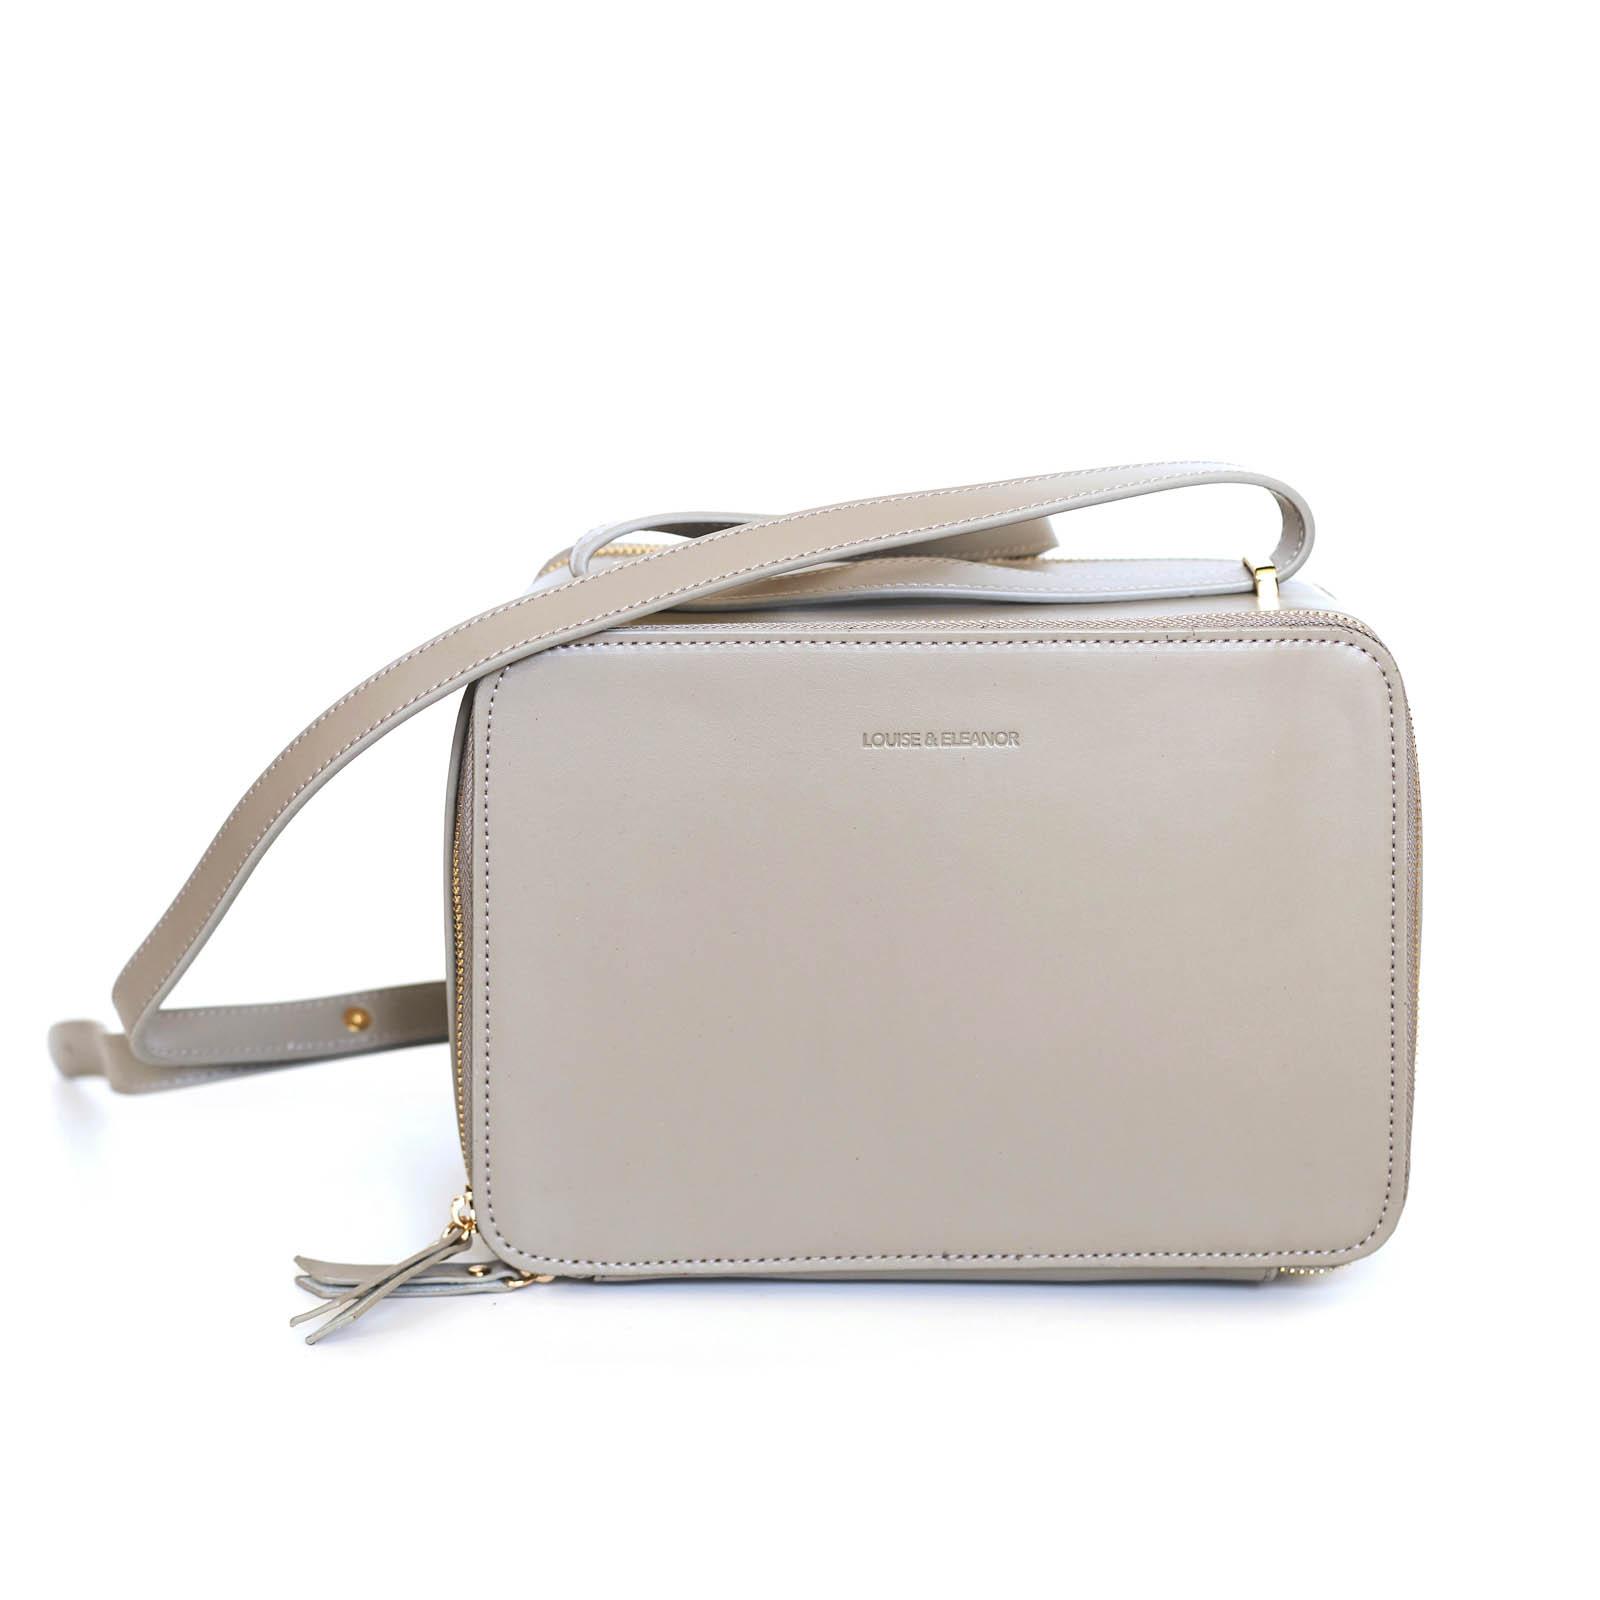 louise-eleanor-bag-1f.jpg